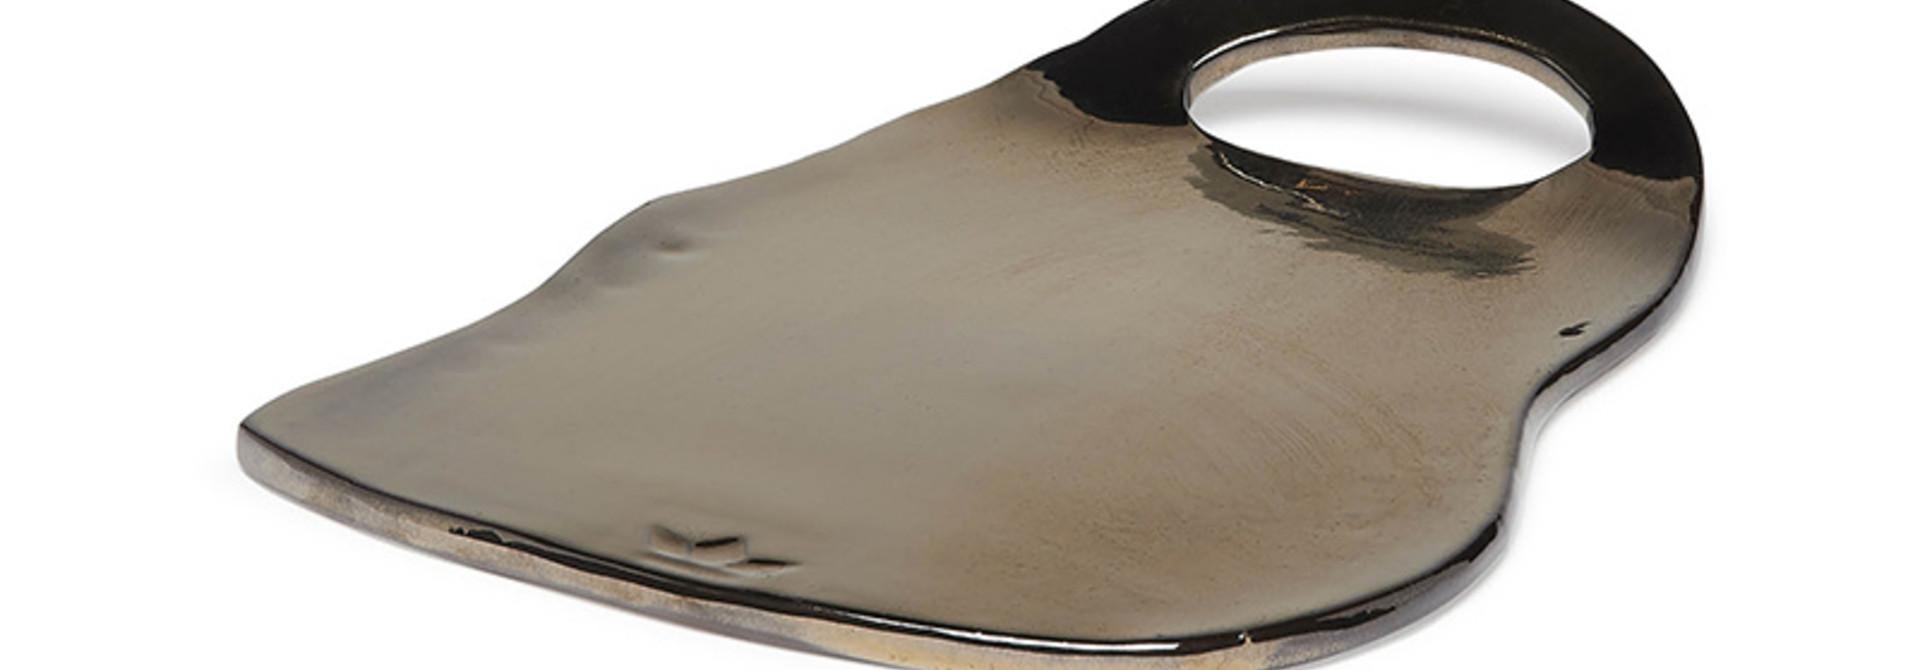 Ceramic Serving Plate -Ted - Platinum - Lge